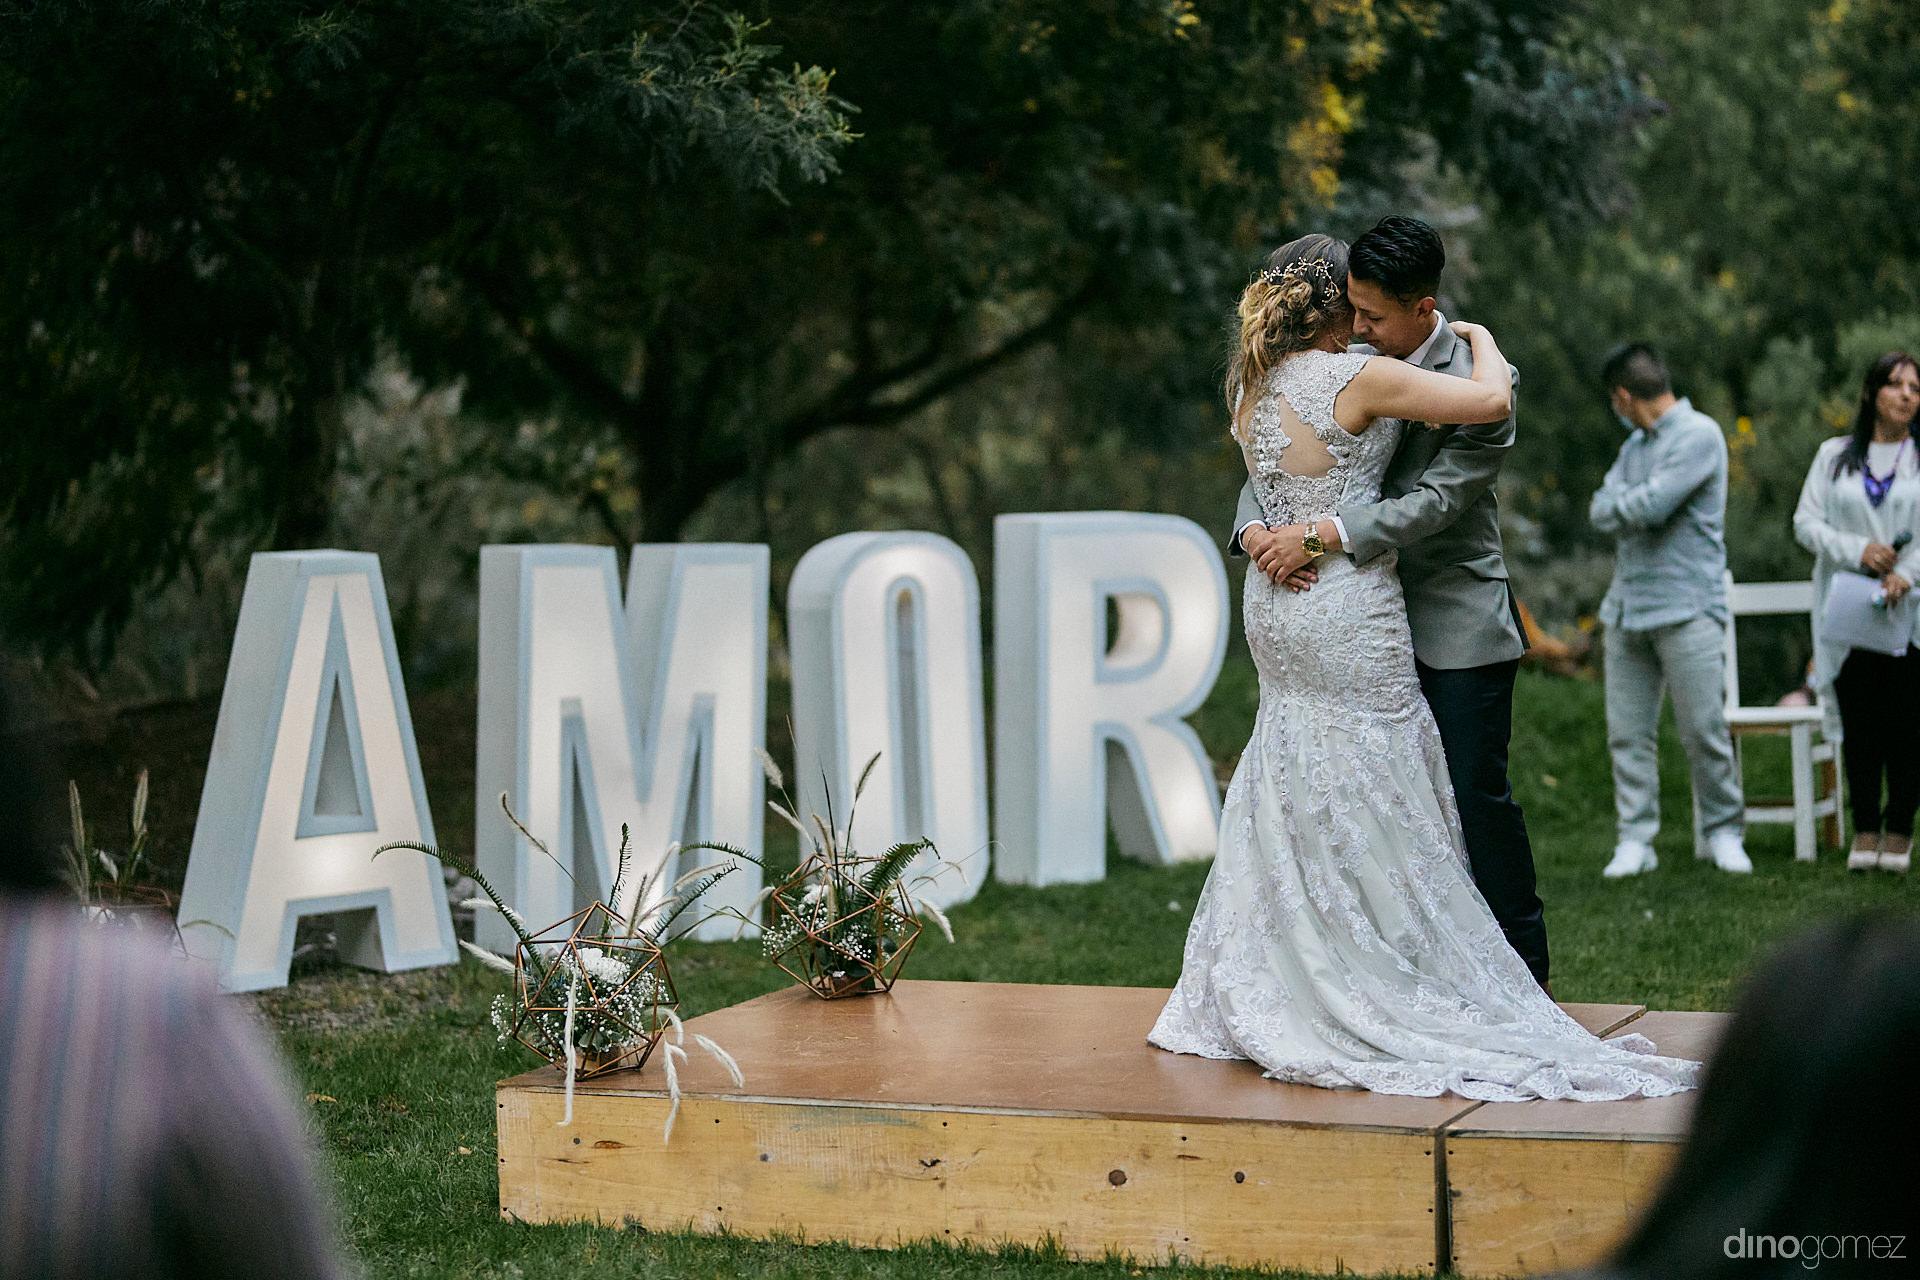 028 - Diy Budget Destination Weddings Can Be Prety Too!